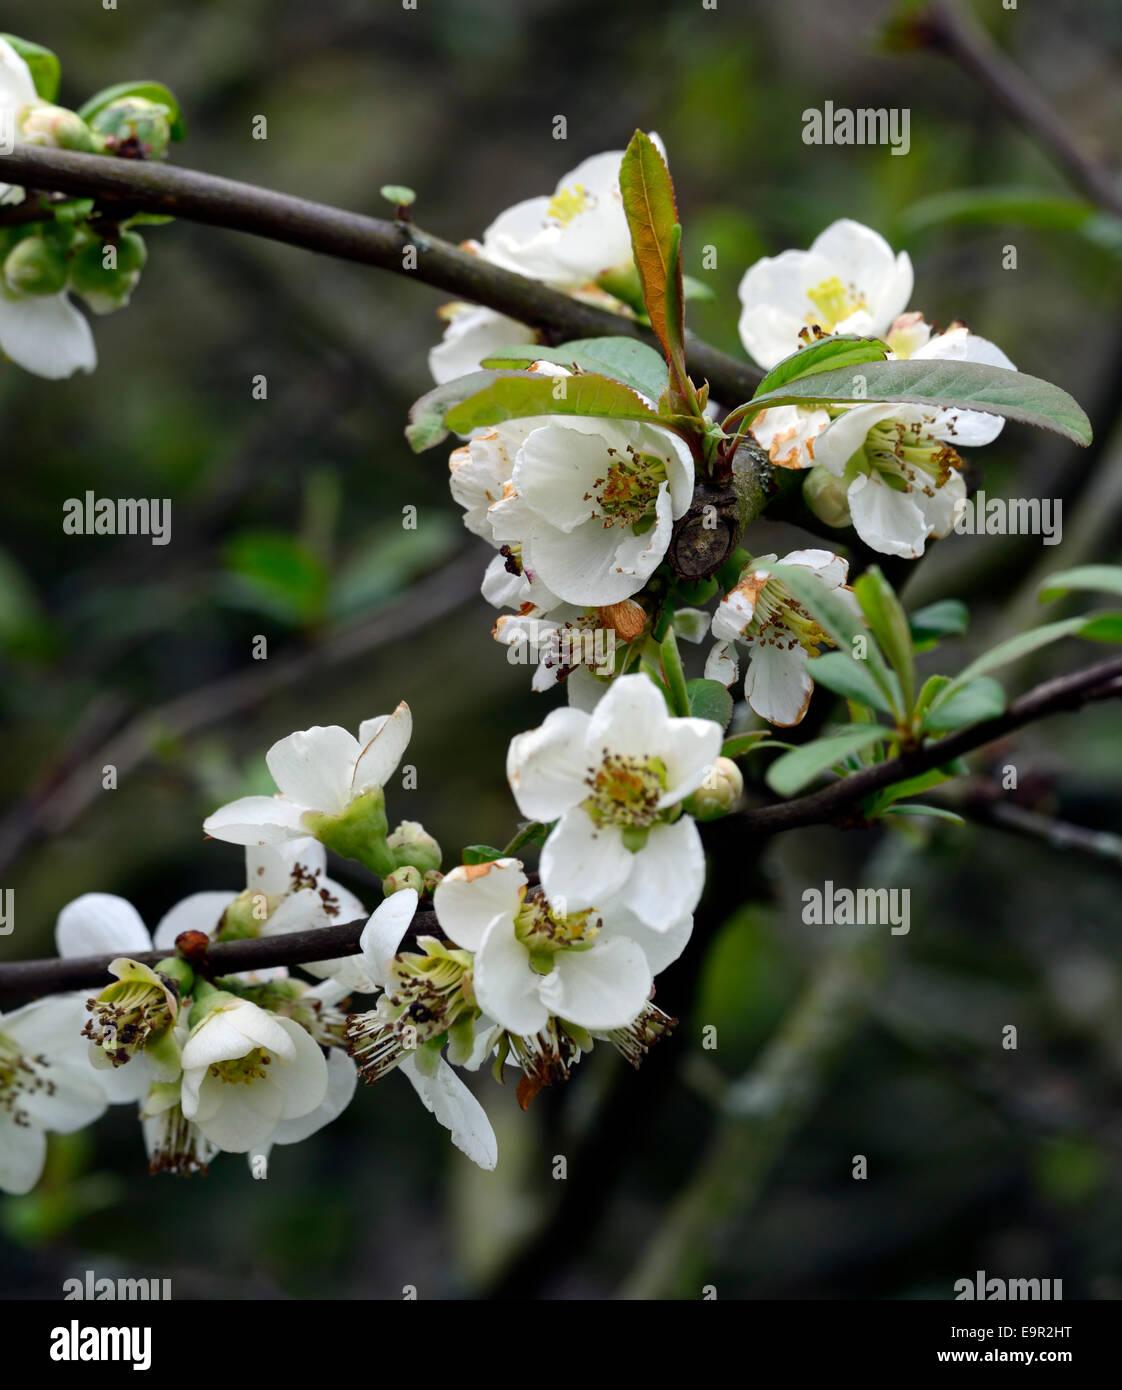 Chaenomeles Speciosa Nivalis Flowering Quince Cultivar Hardy Shrub